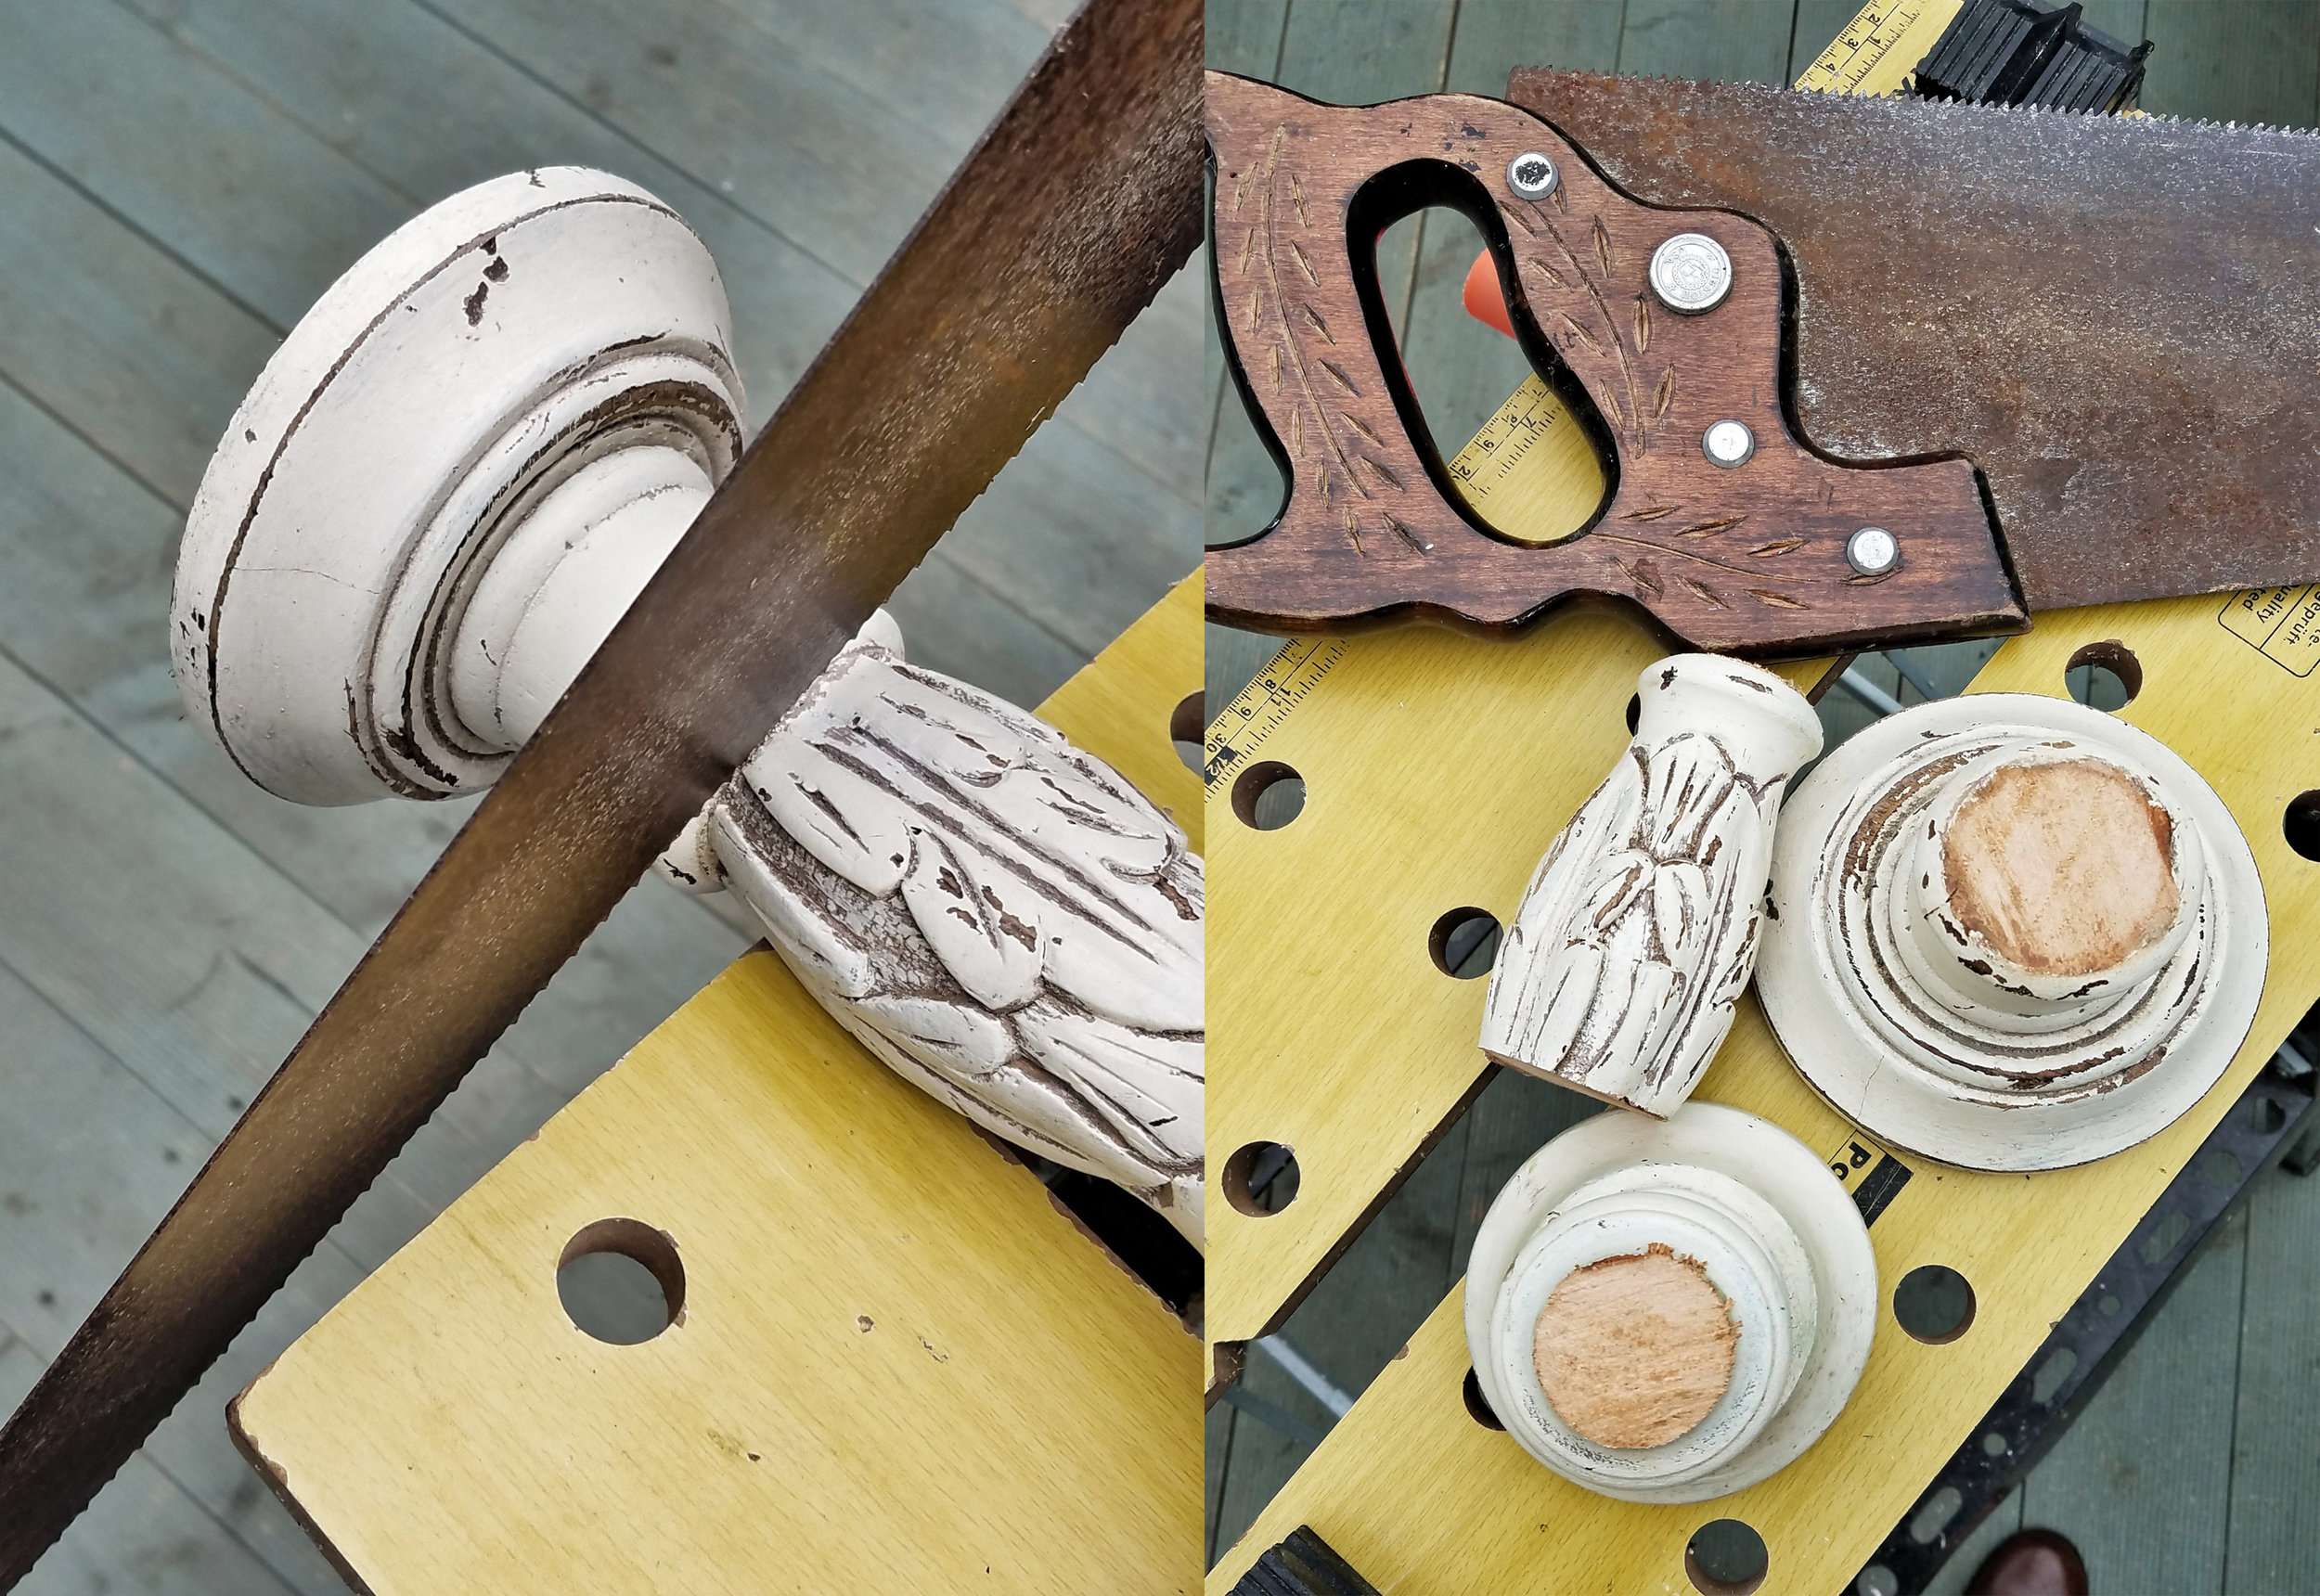 DIY - Rustic wooden cake stands